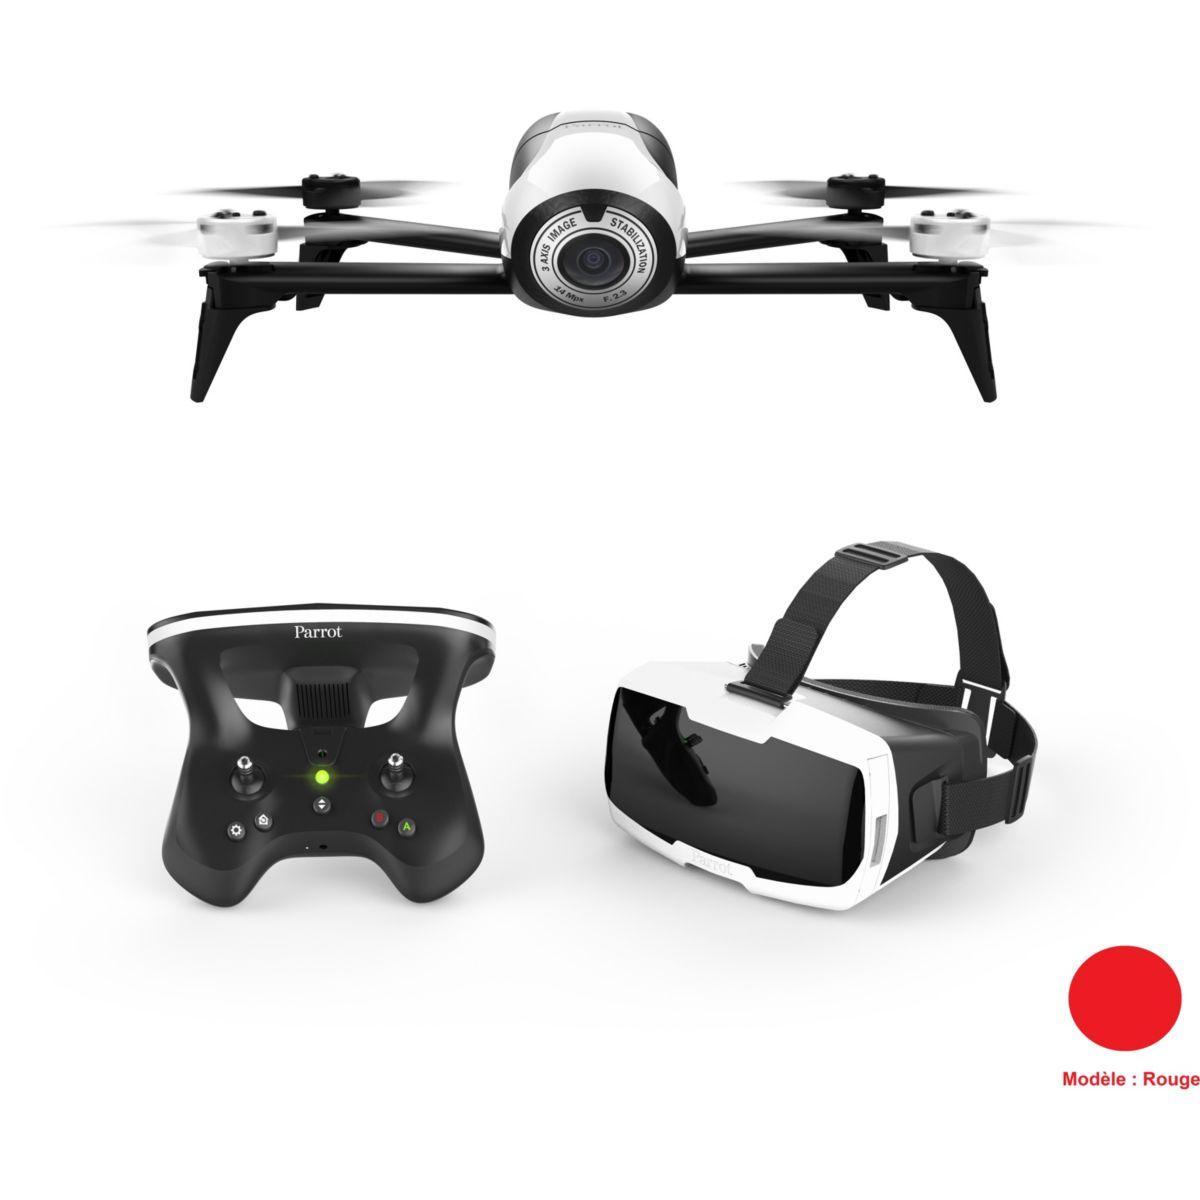 Drone parrot bebop 2 rouge + pack fpv - livraison offerte : code livpremium (photo)